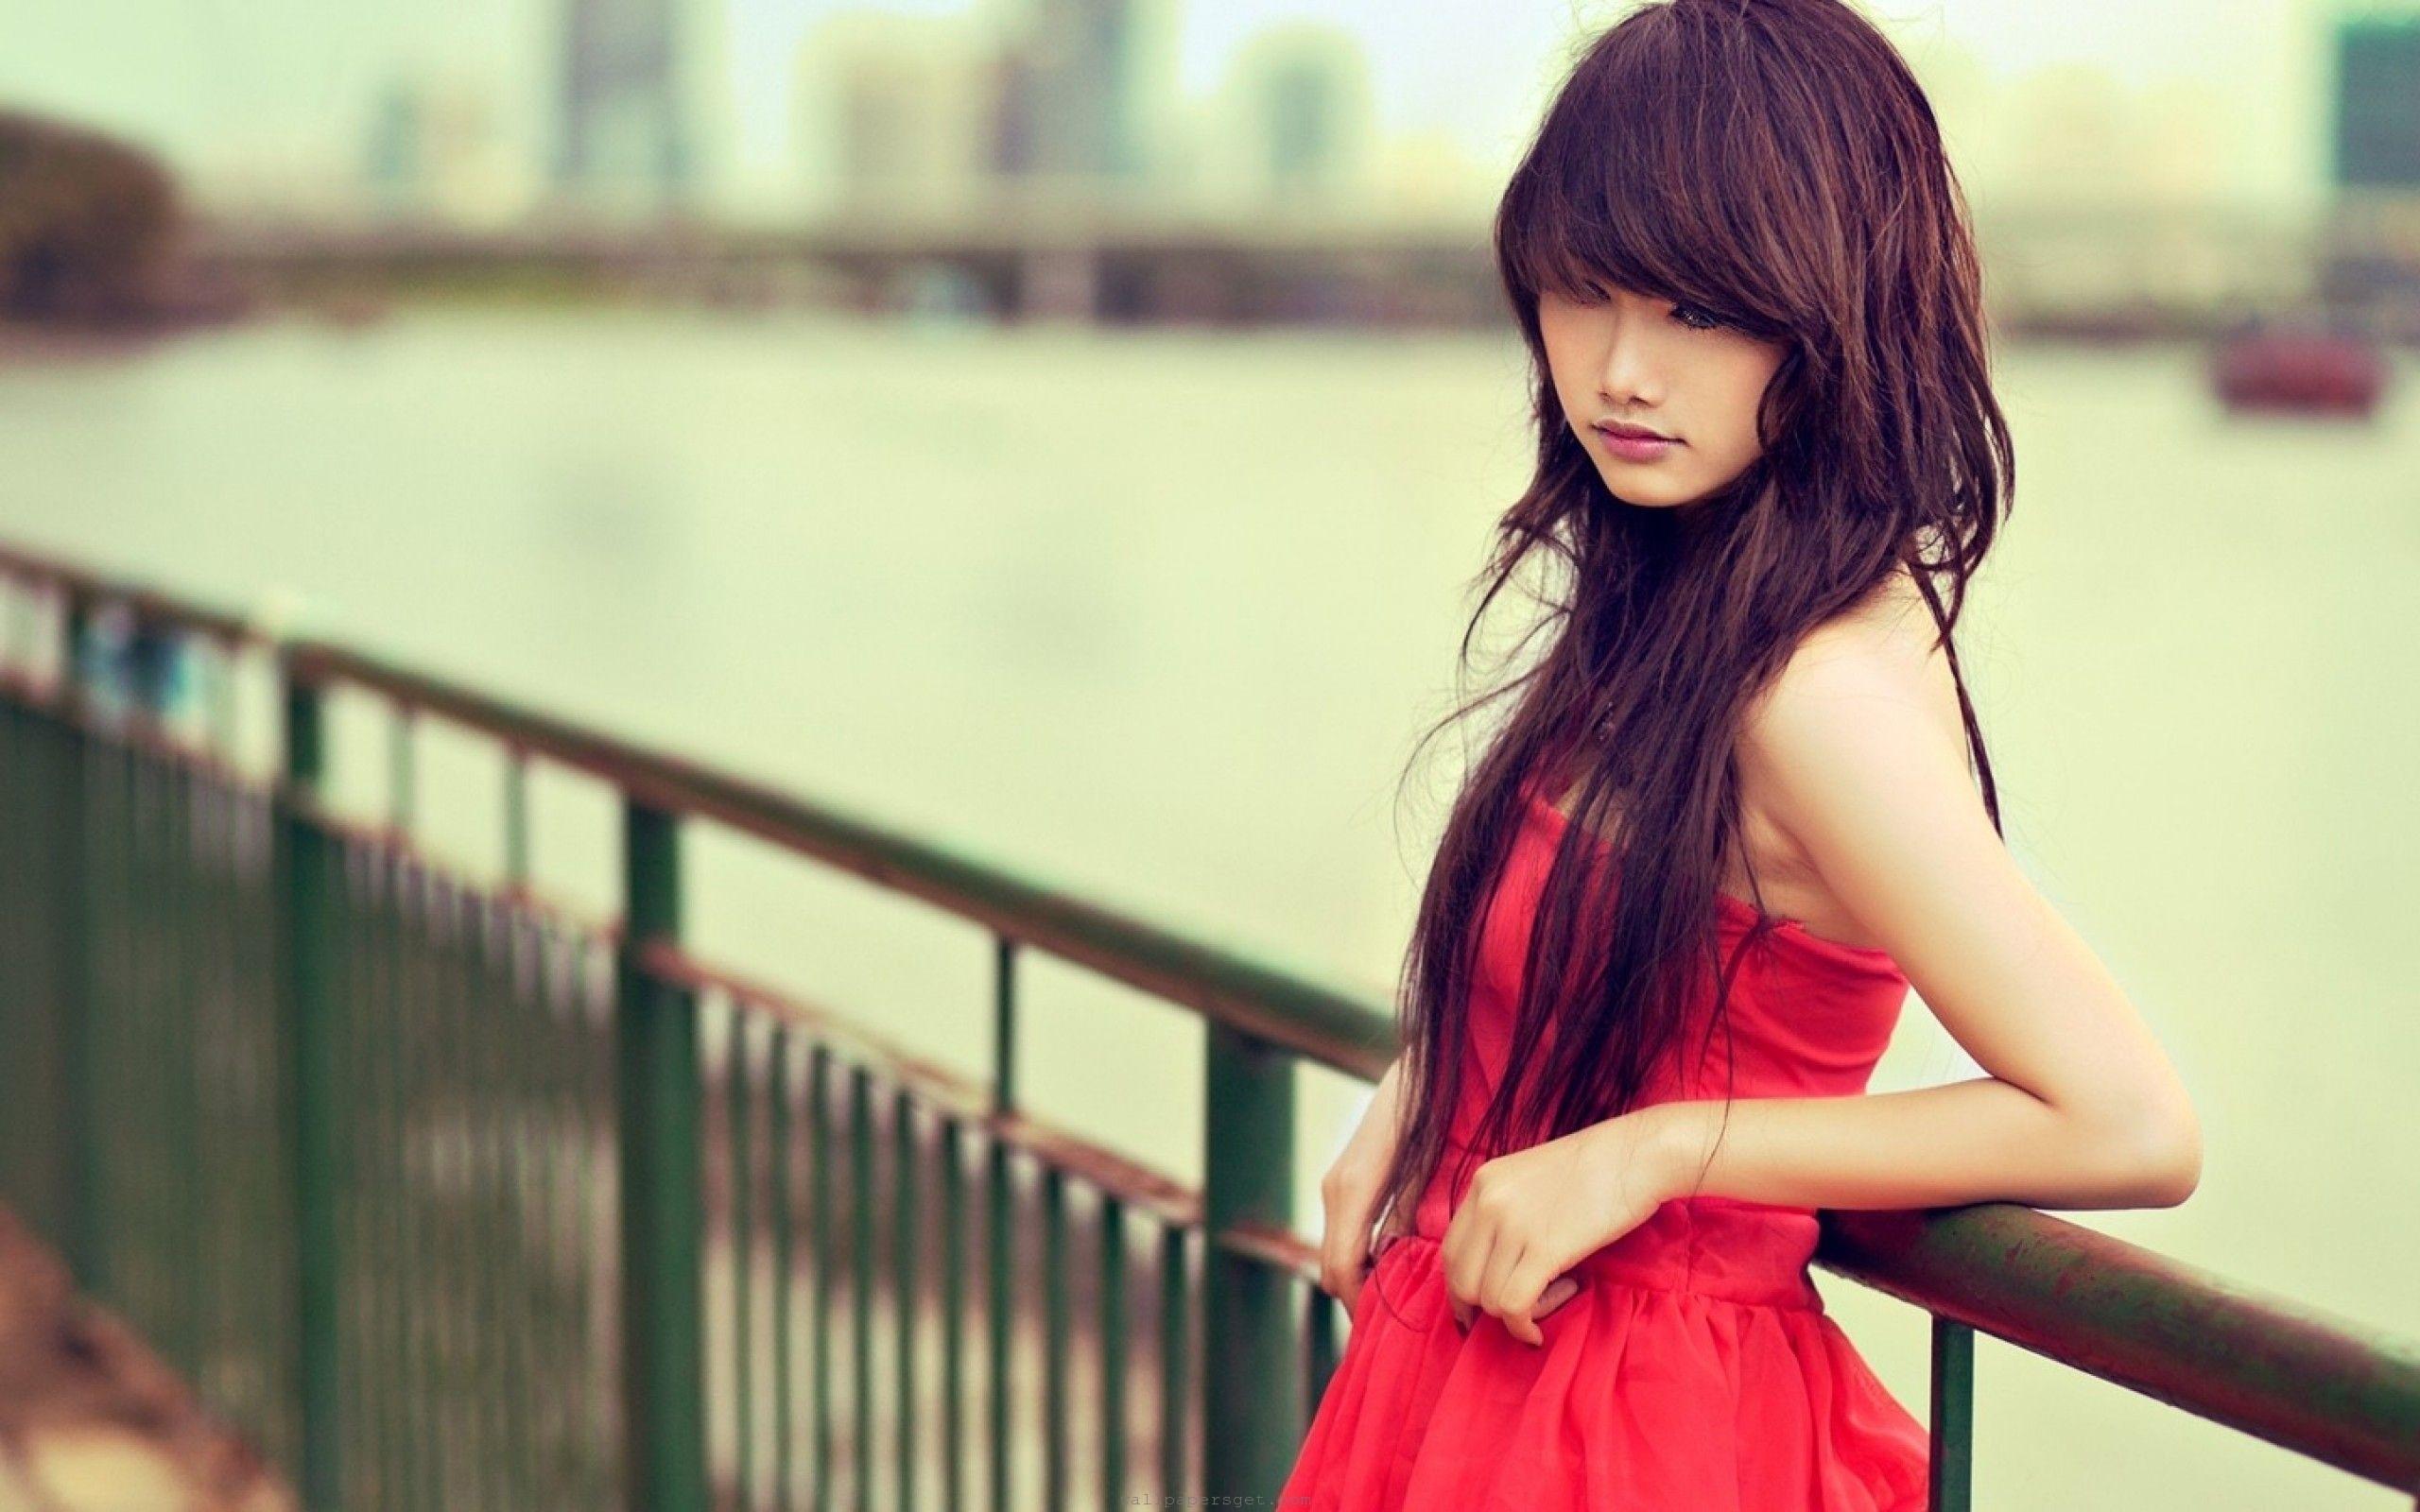 Cute And Beautiful Asian Girls Wallpapers Full HD Free Download